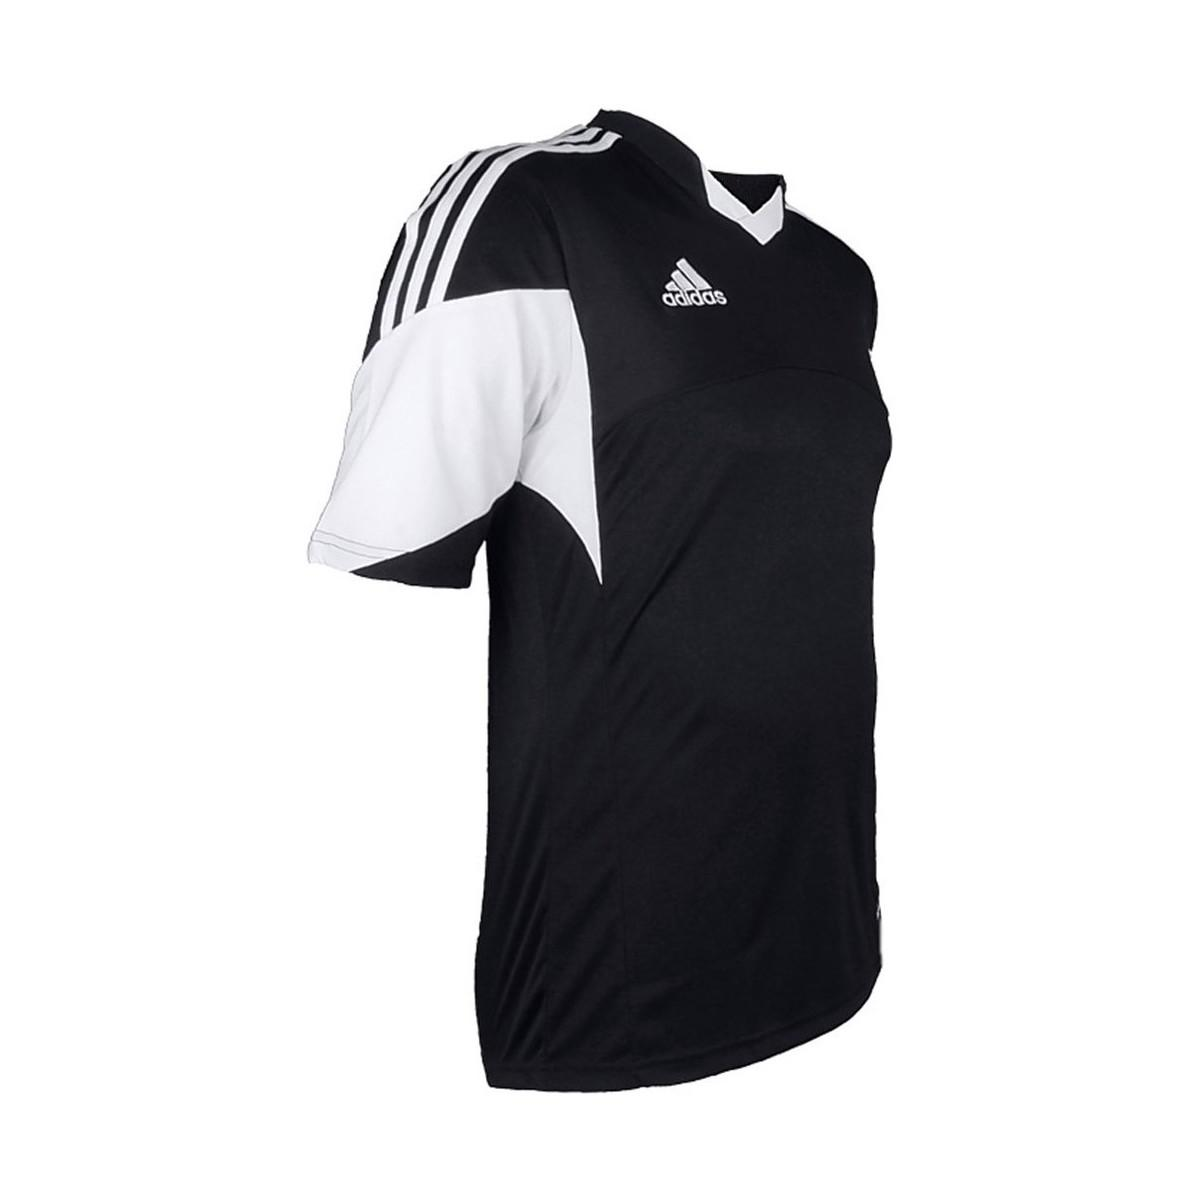 c5dd3a0e1 adidas Tiro 13 Kurzarm Trikot Men s T Shirt In Black in Black for ...